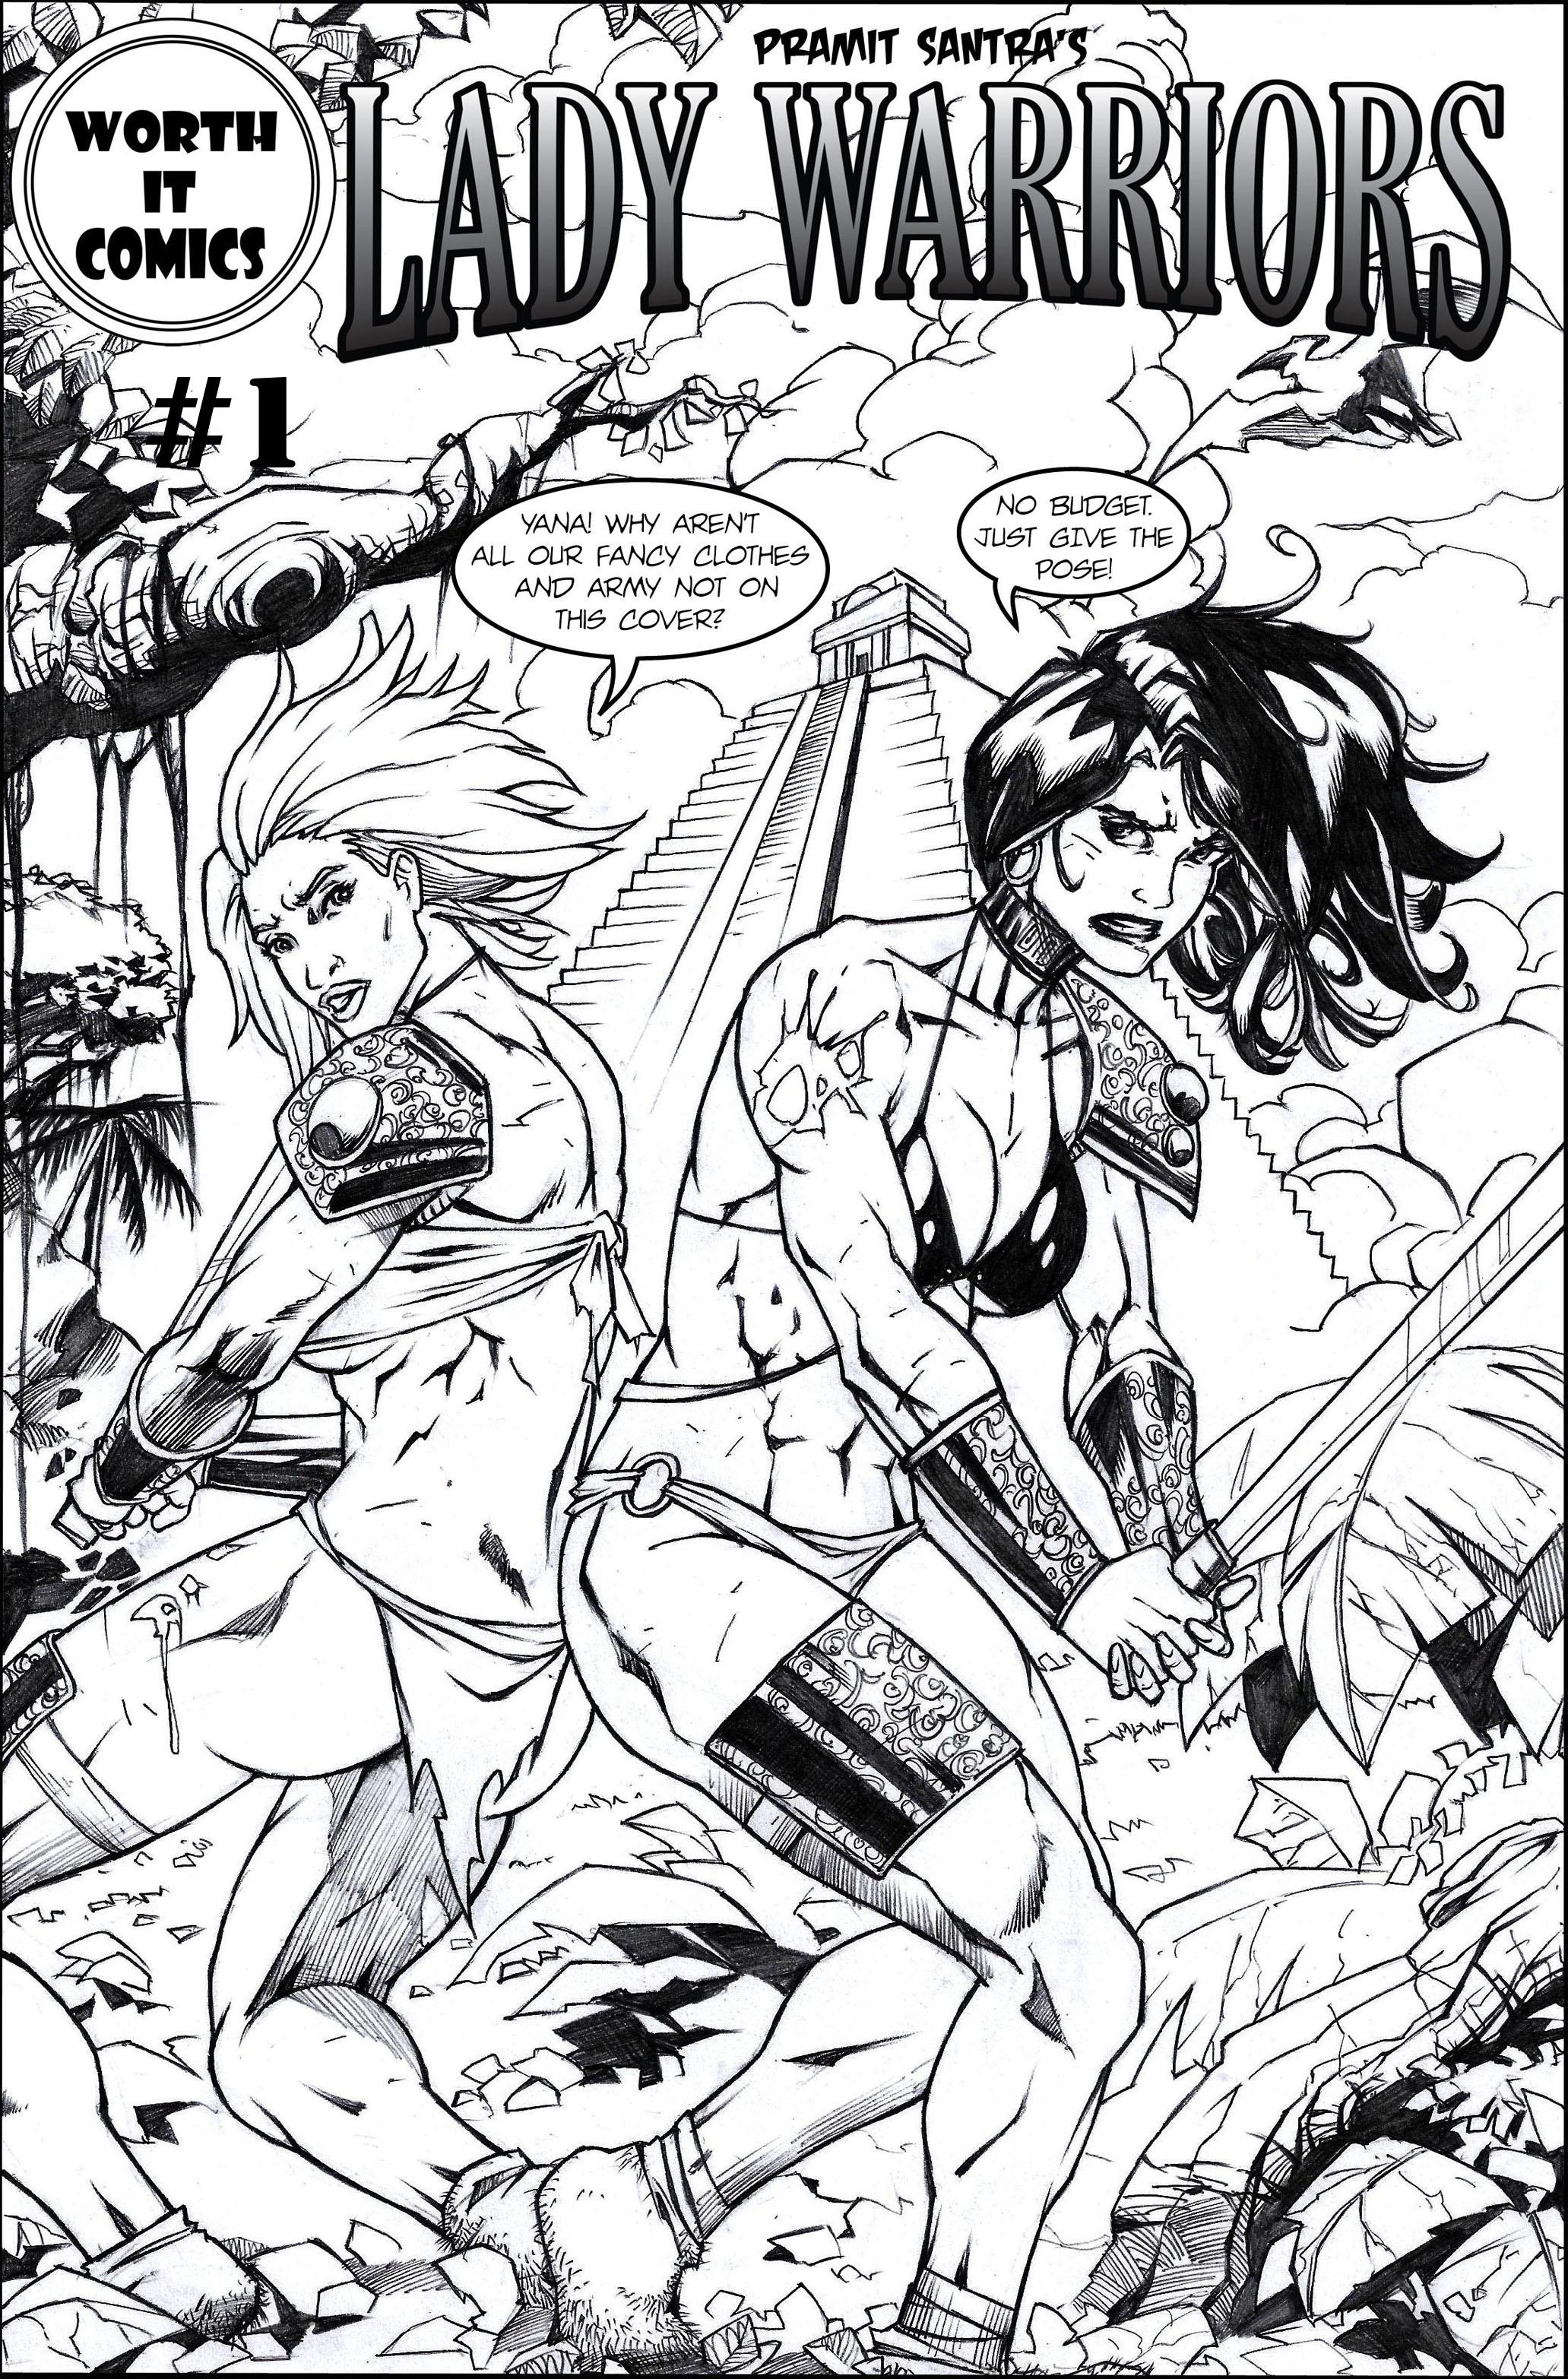 Lady Warriors #1-full pdf by Alf-Alpha